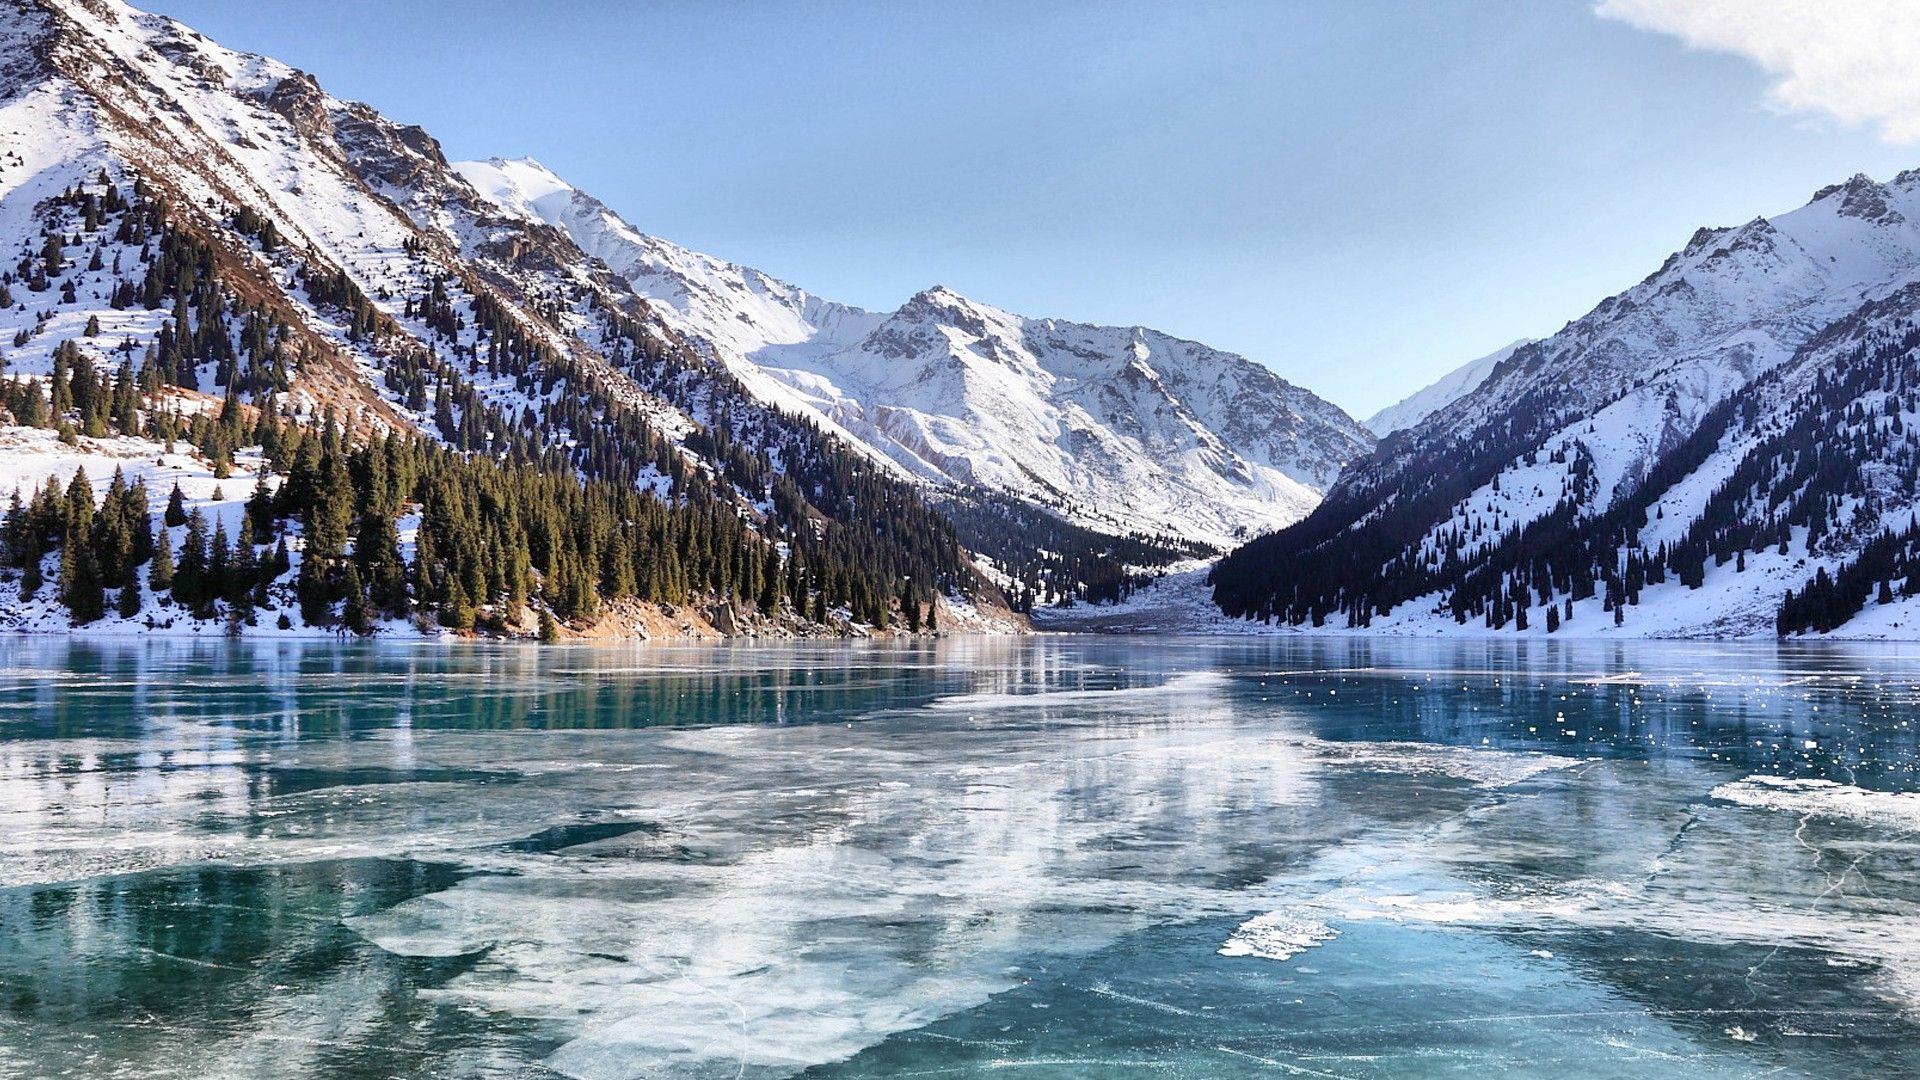 Hd wallpaper lake ice mountains valley